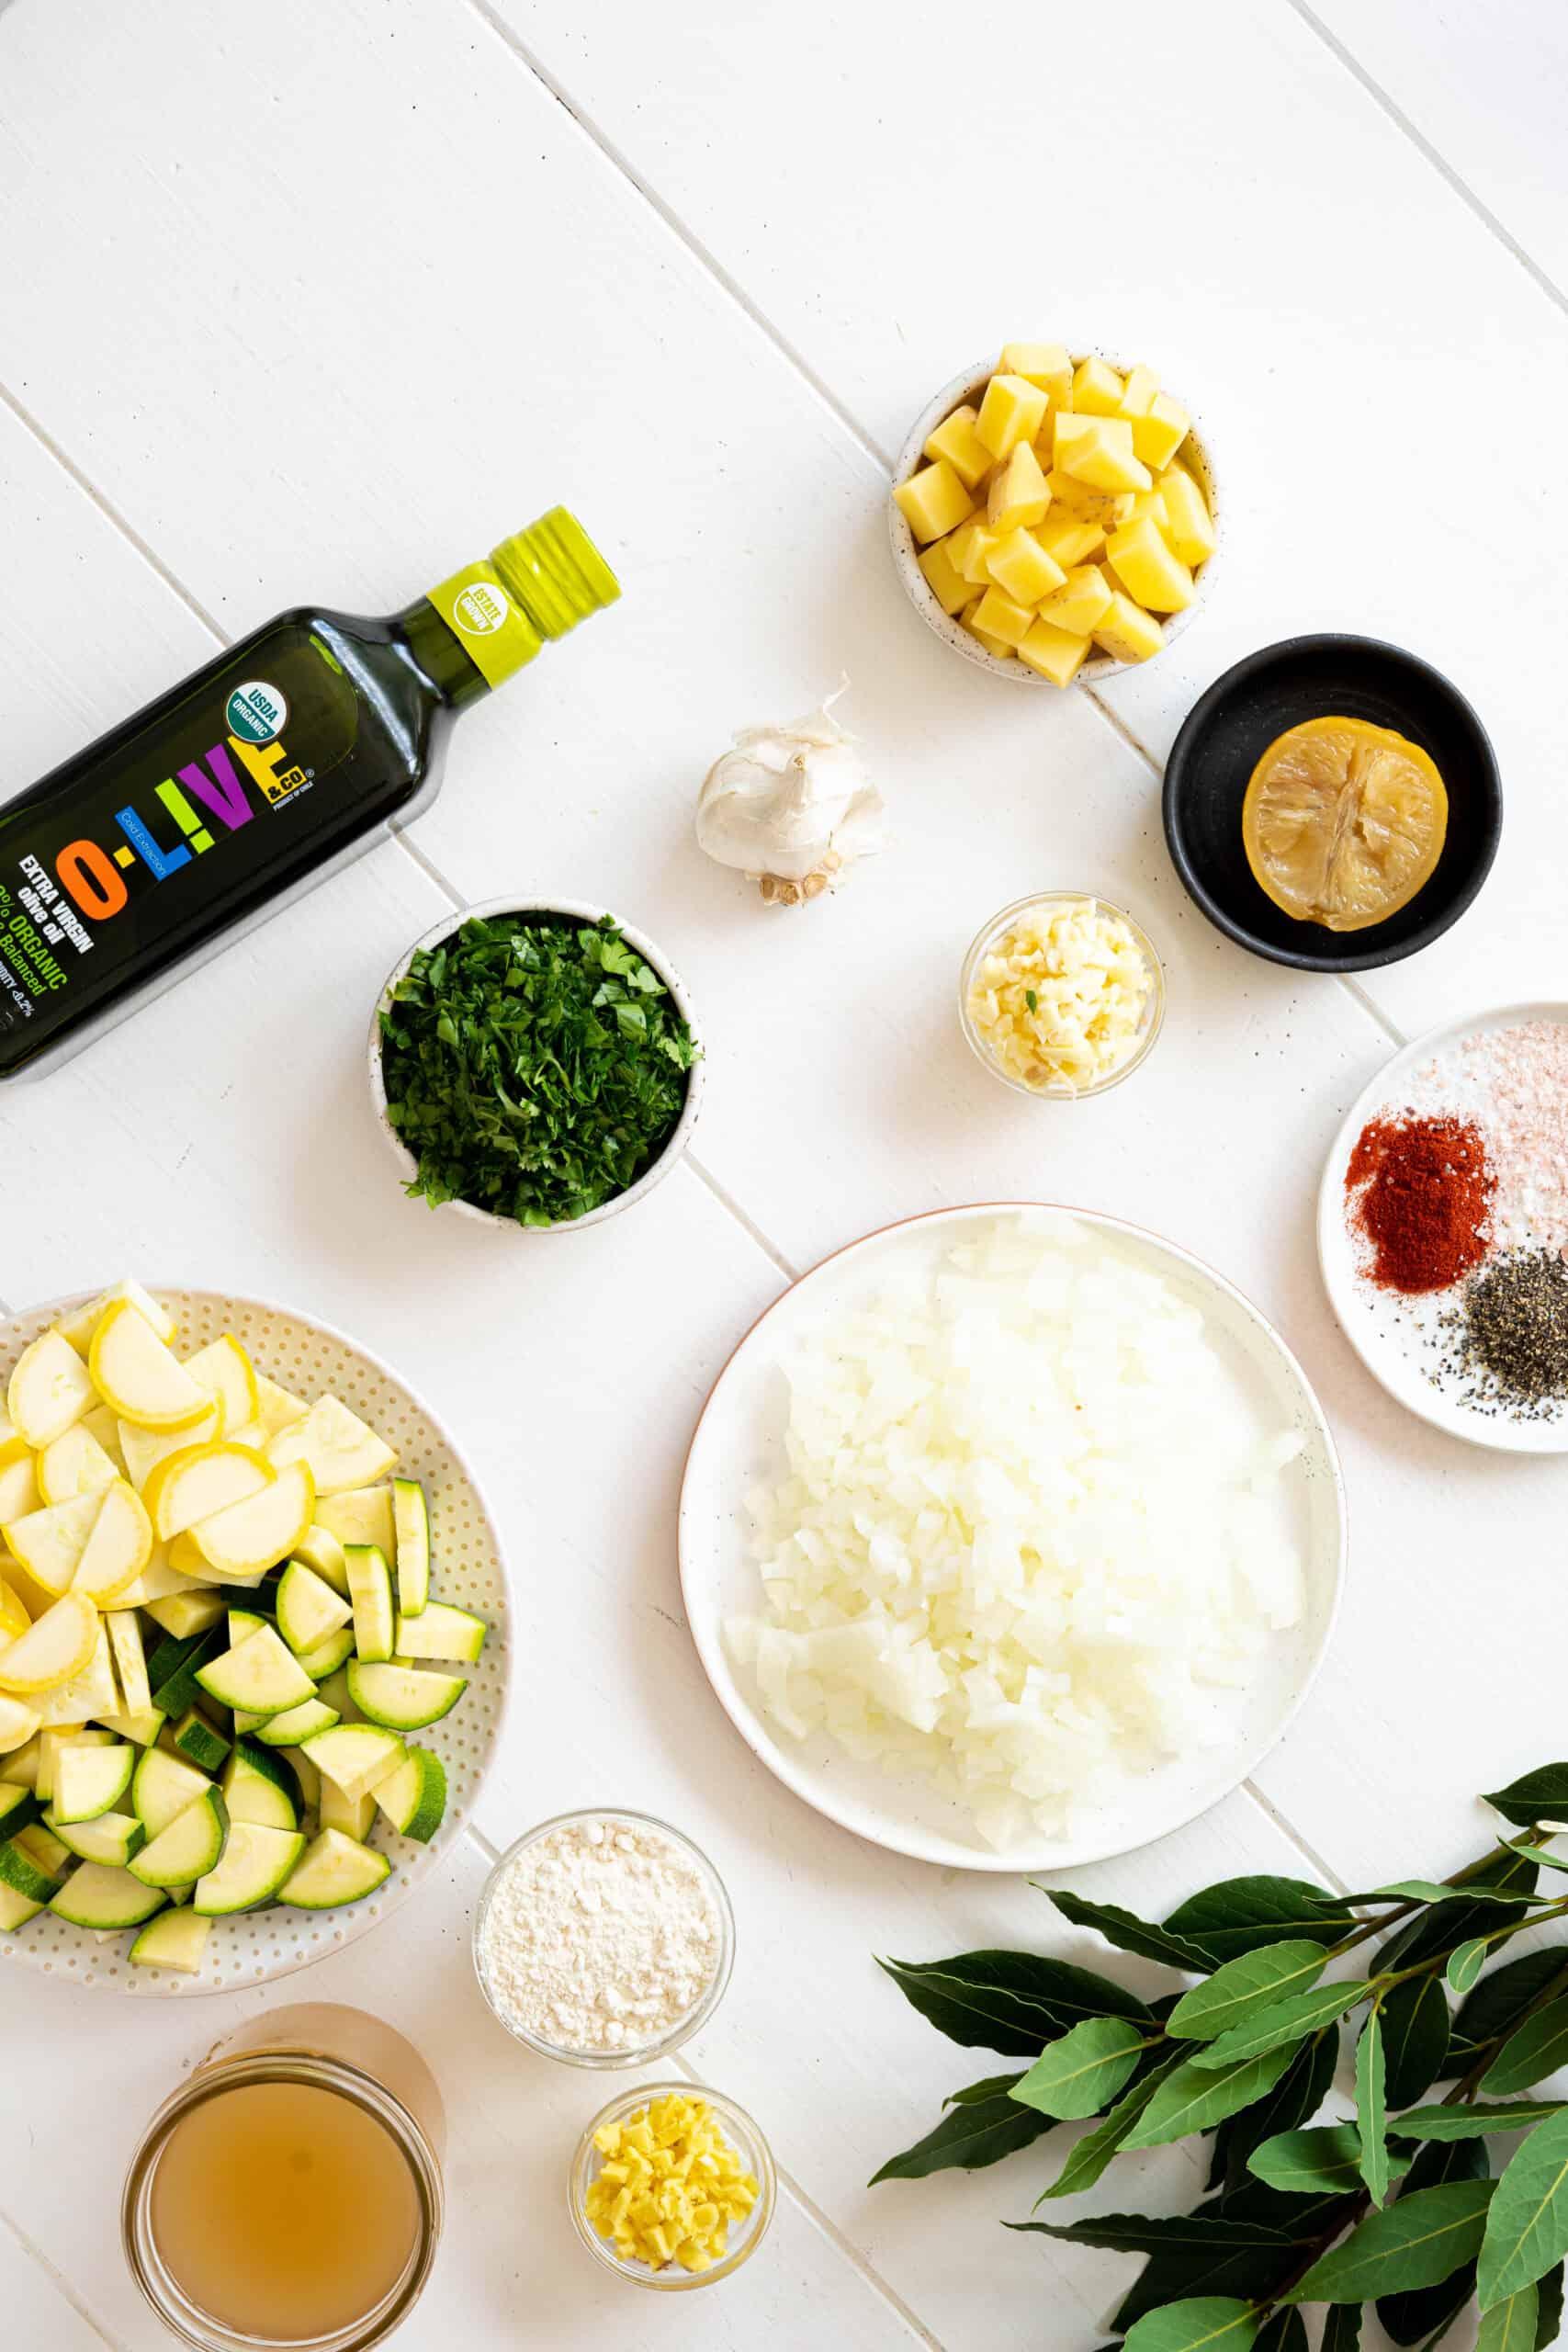 Ingredients to make Moroccan fish stew